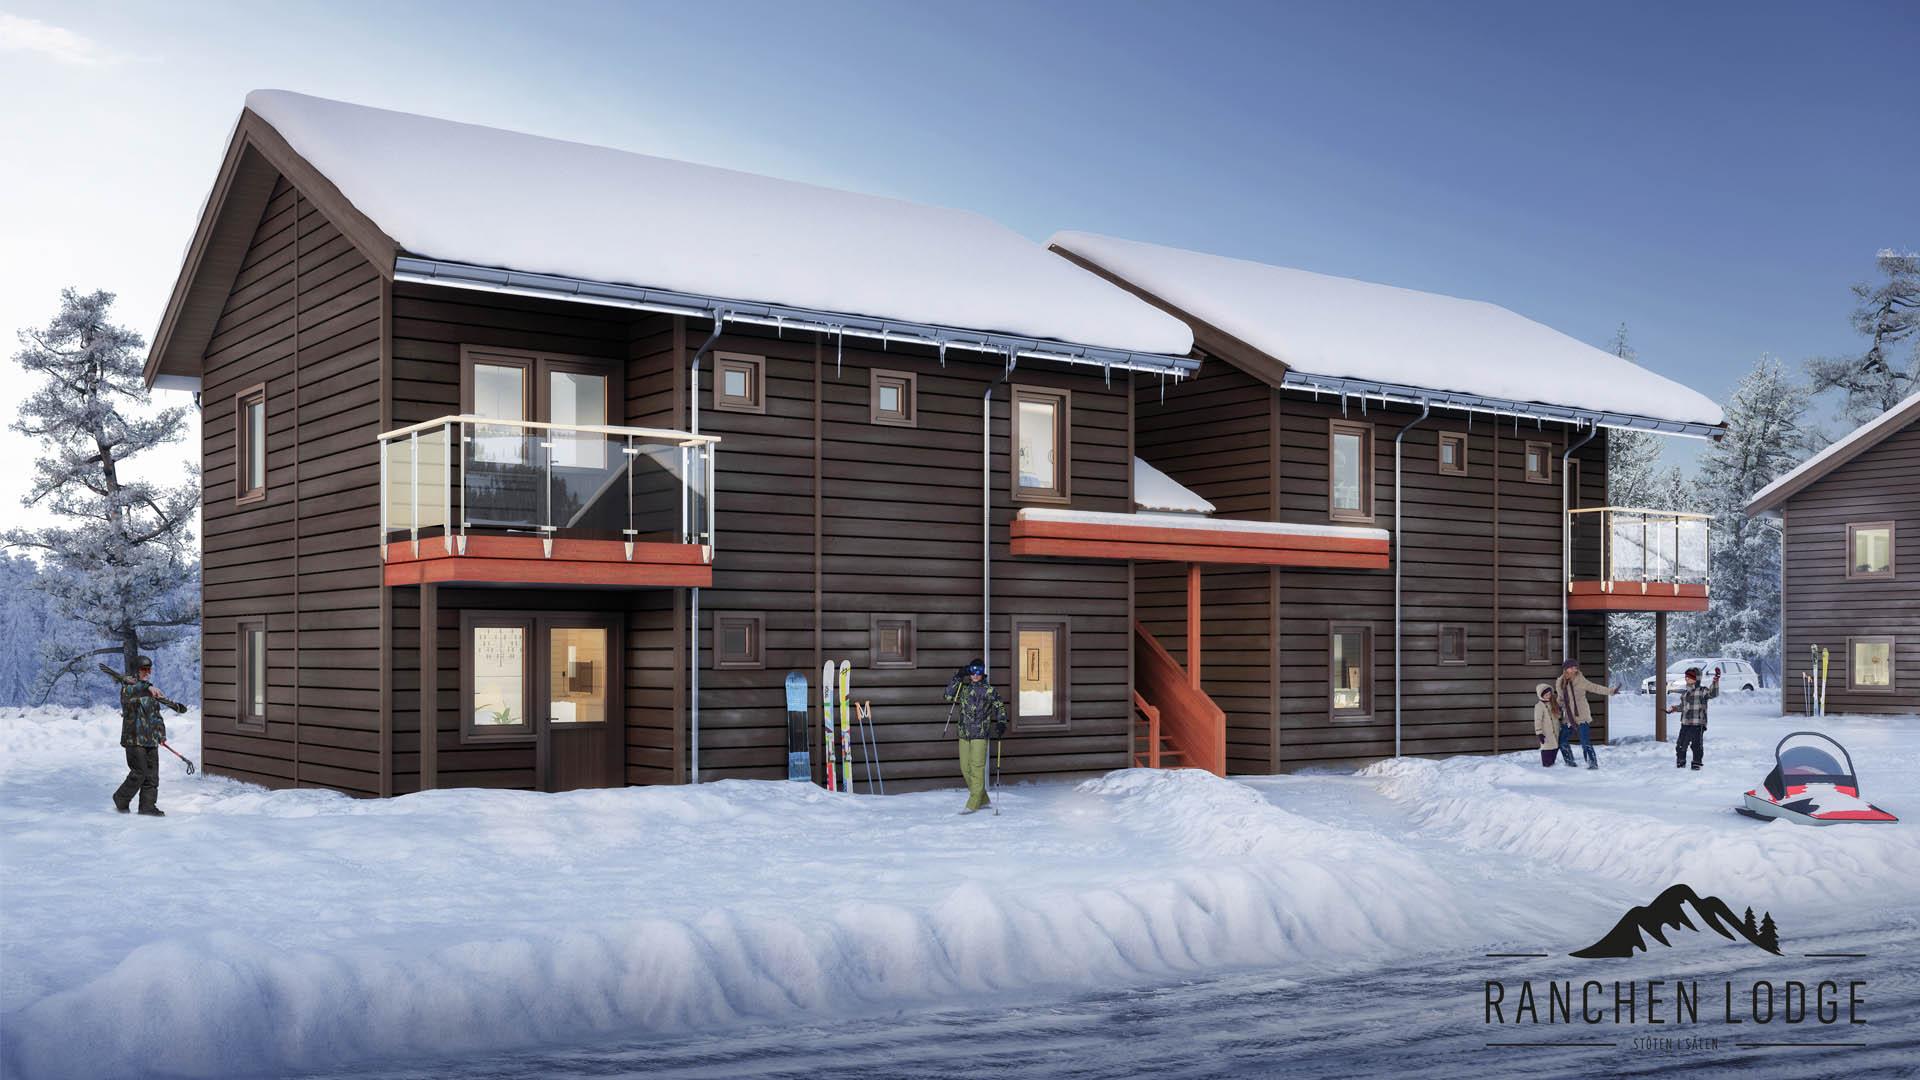 Ranchen Lodge - Exteriör